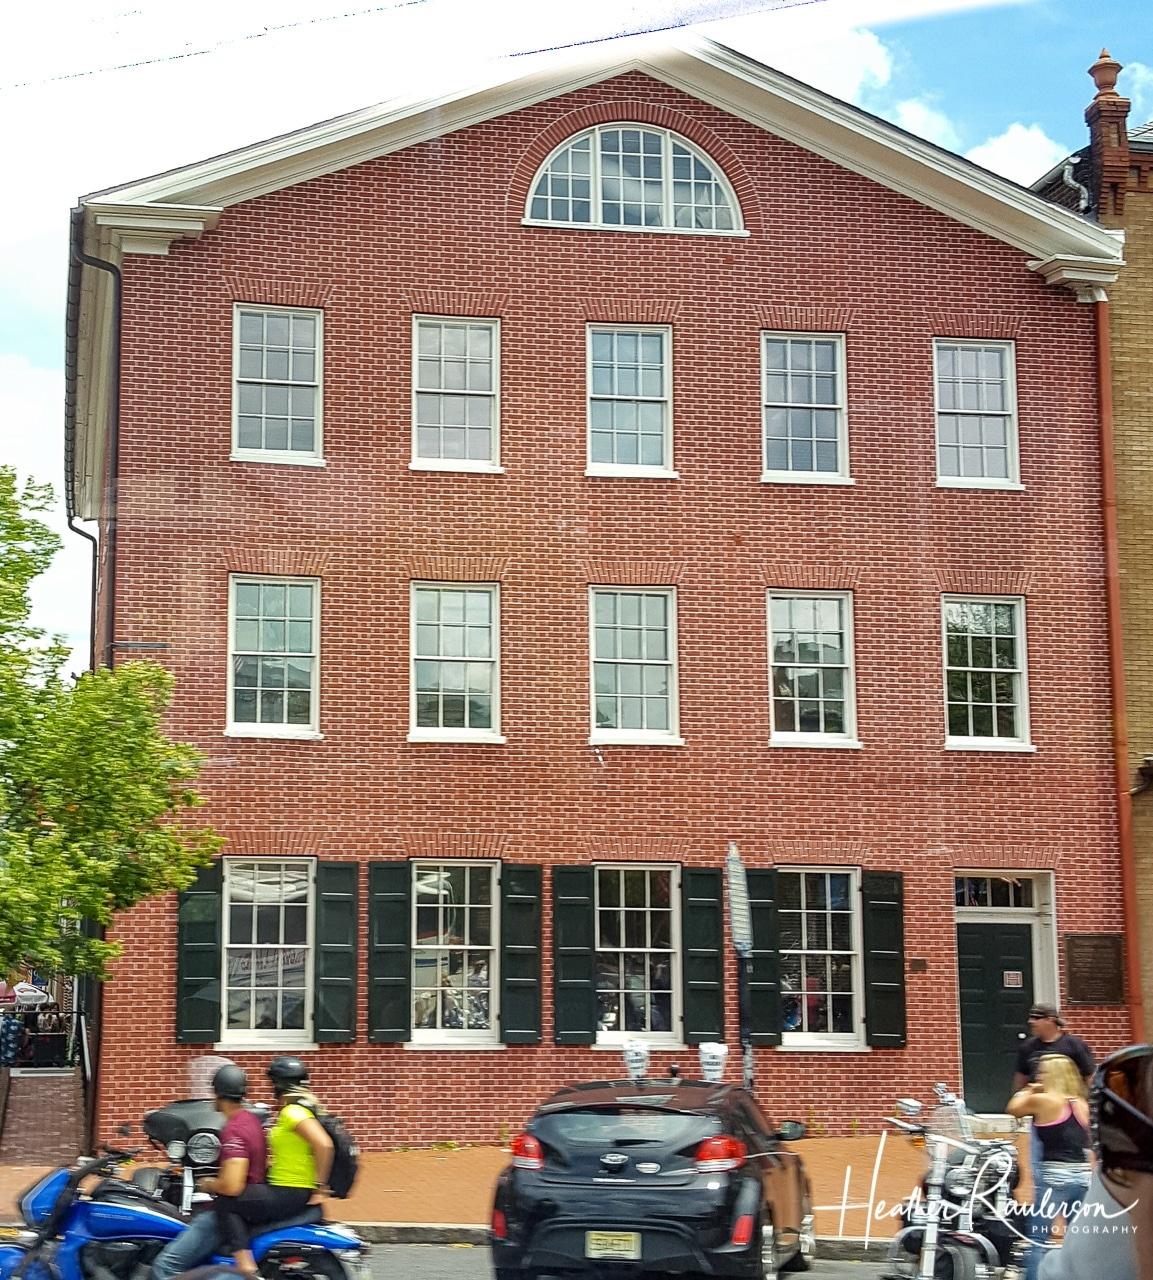 David Wills House in Gettysburg